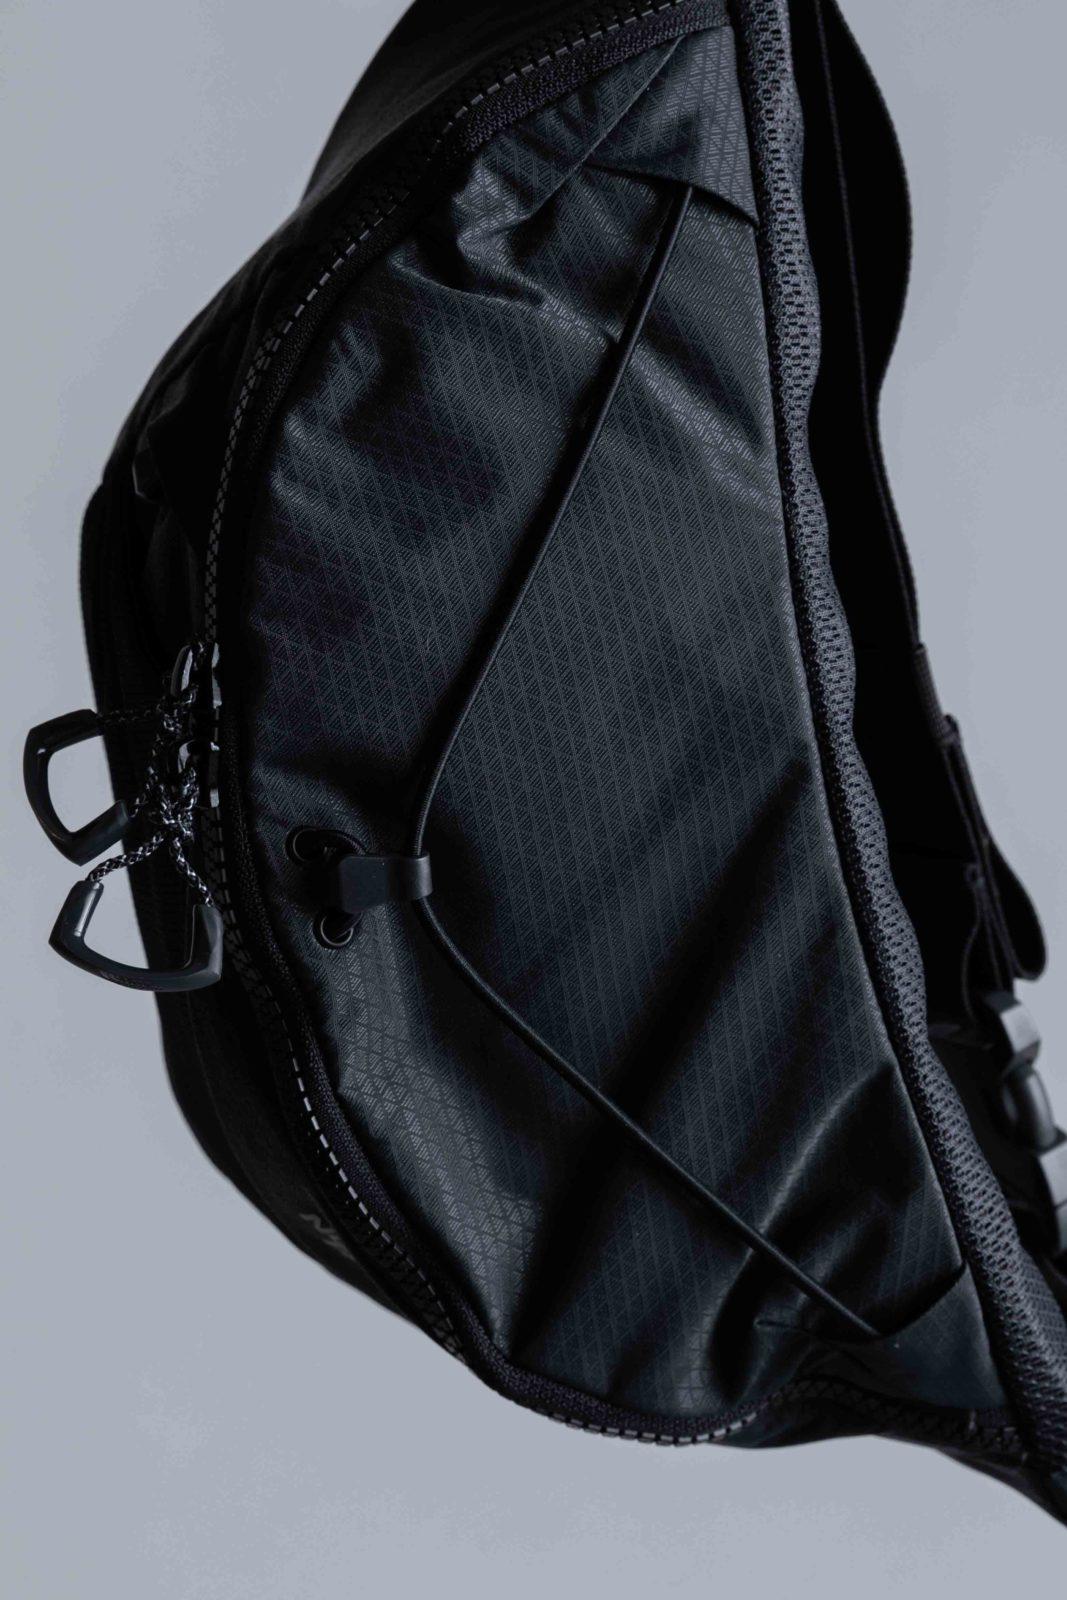 e6ec89600 The North Face Lumbnical Lumbar Waist Bag sales - Centrevillestore